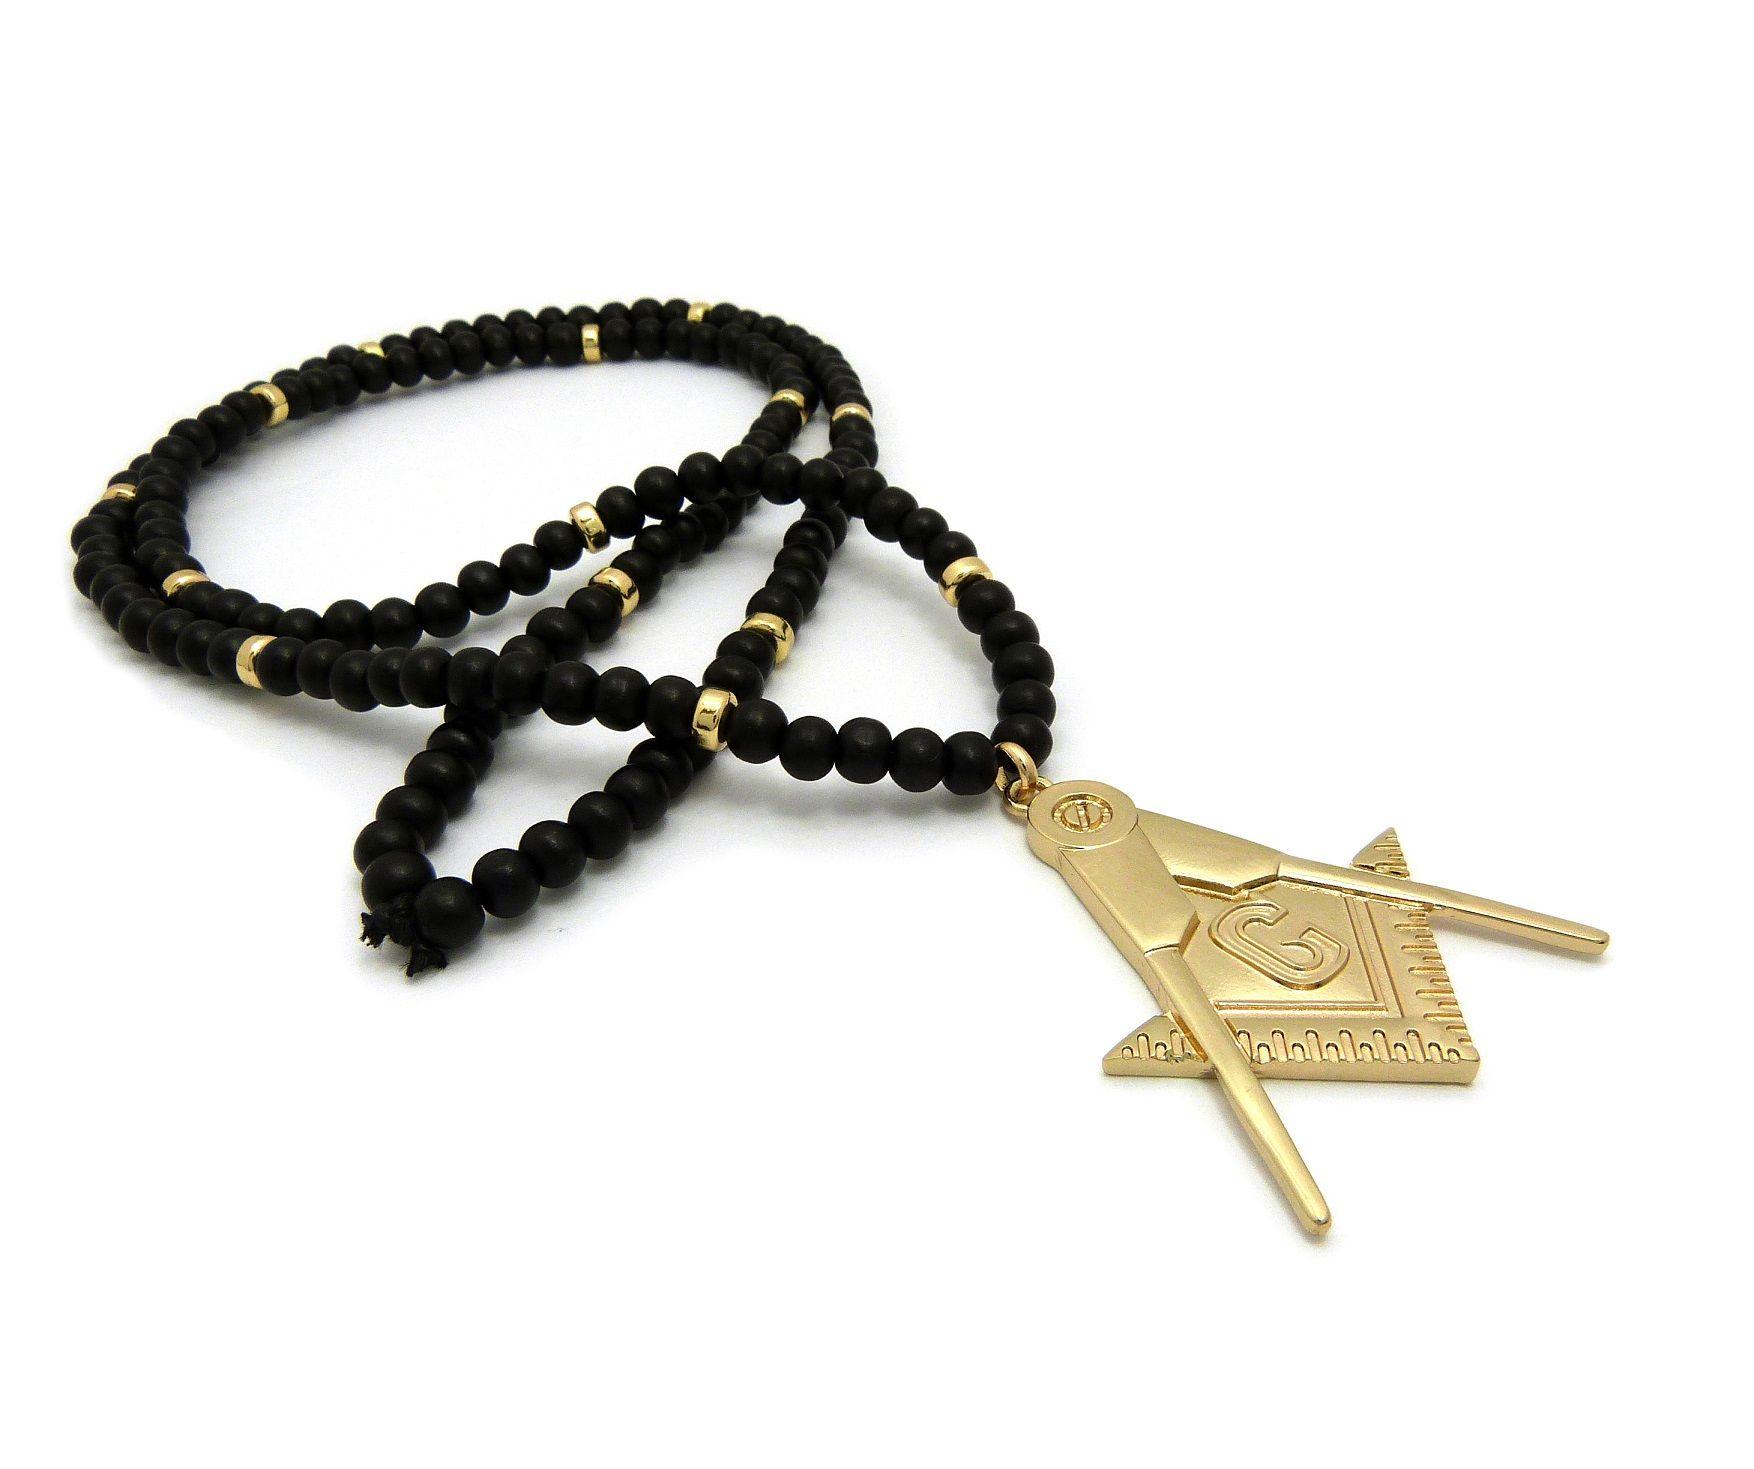 Freemason pendant 30 wood bead chain hip hop necklace accessory freemason pendant 30 wood bead chain hip hop necklace mozeypictures Choice Image